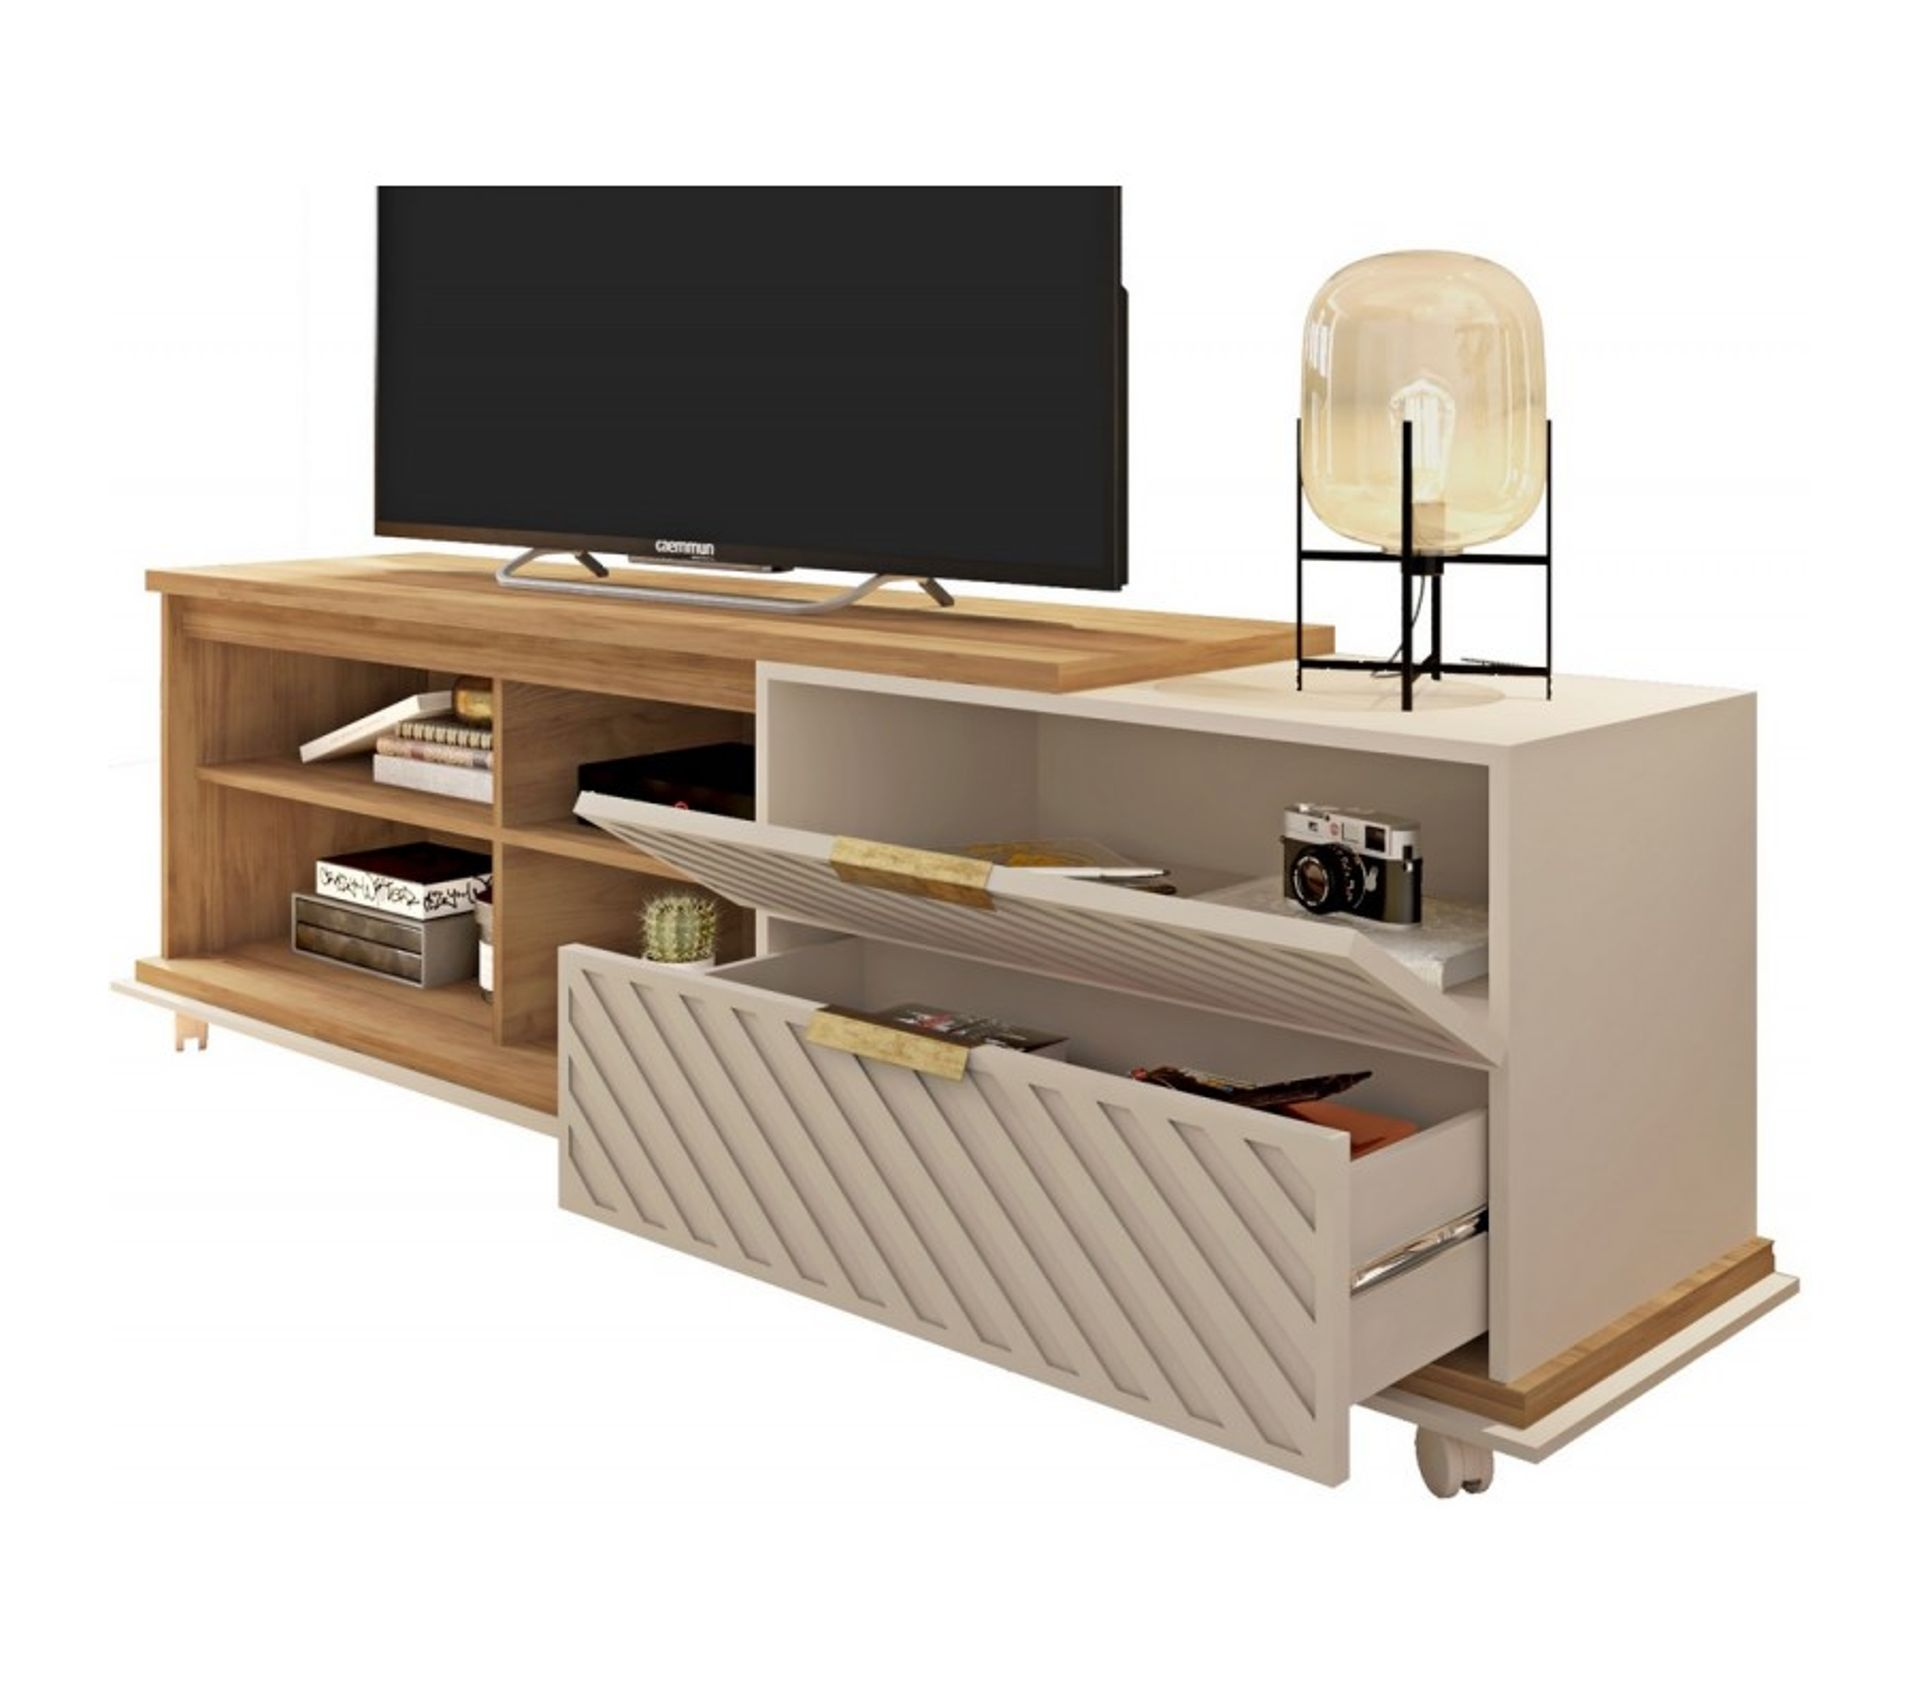 meuble tv 180 cm tv 65 pouces chene ecru